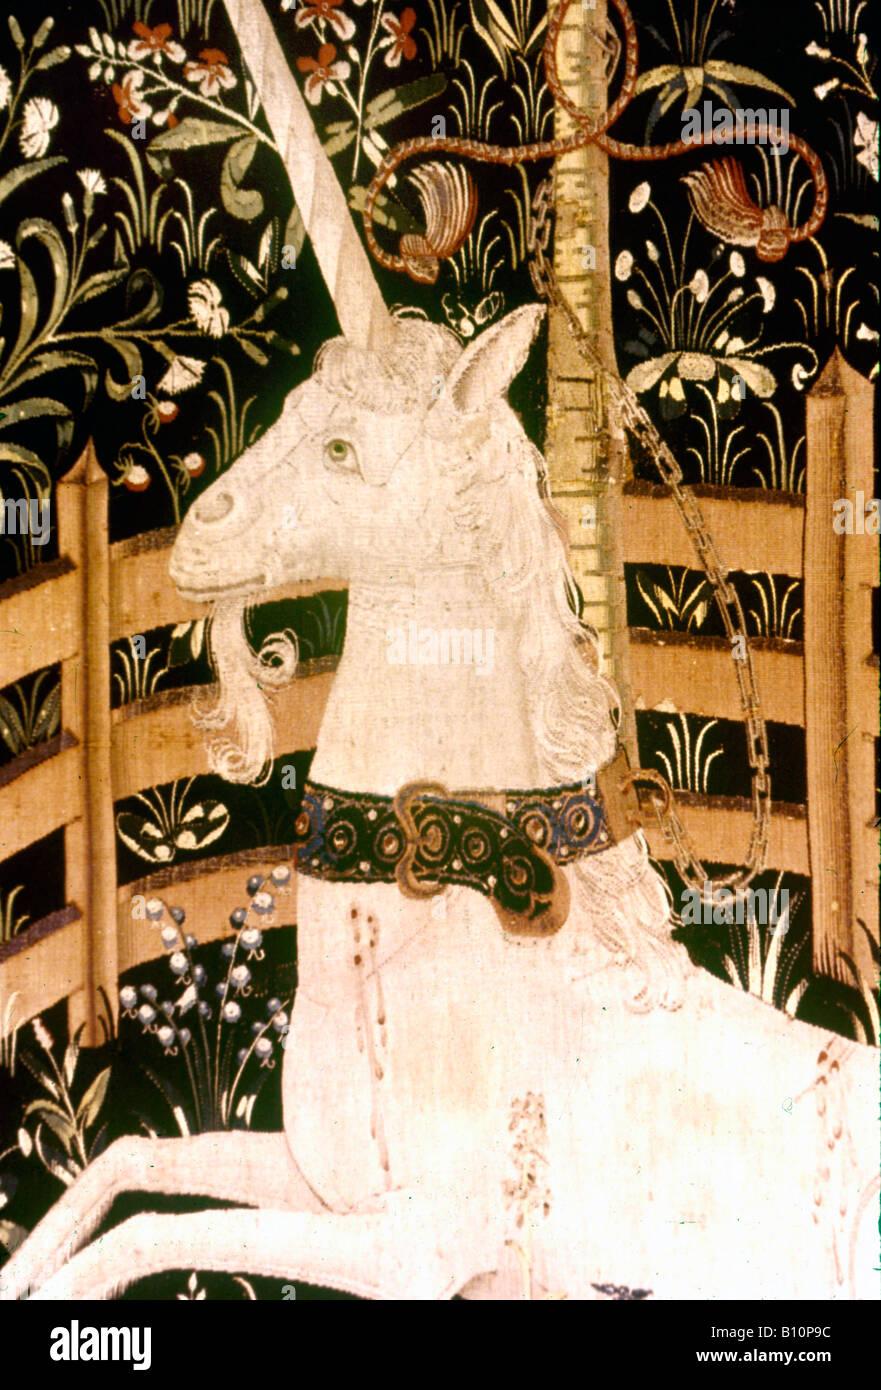 Flemish Tapestry unicorn 1500 Belgium  ©The Ancient Art & Architecture Collection Ltd. - Stock Image